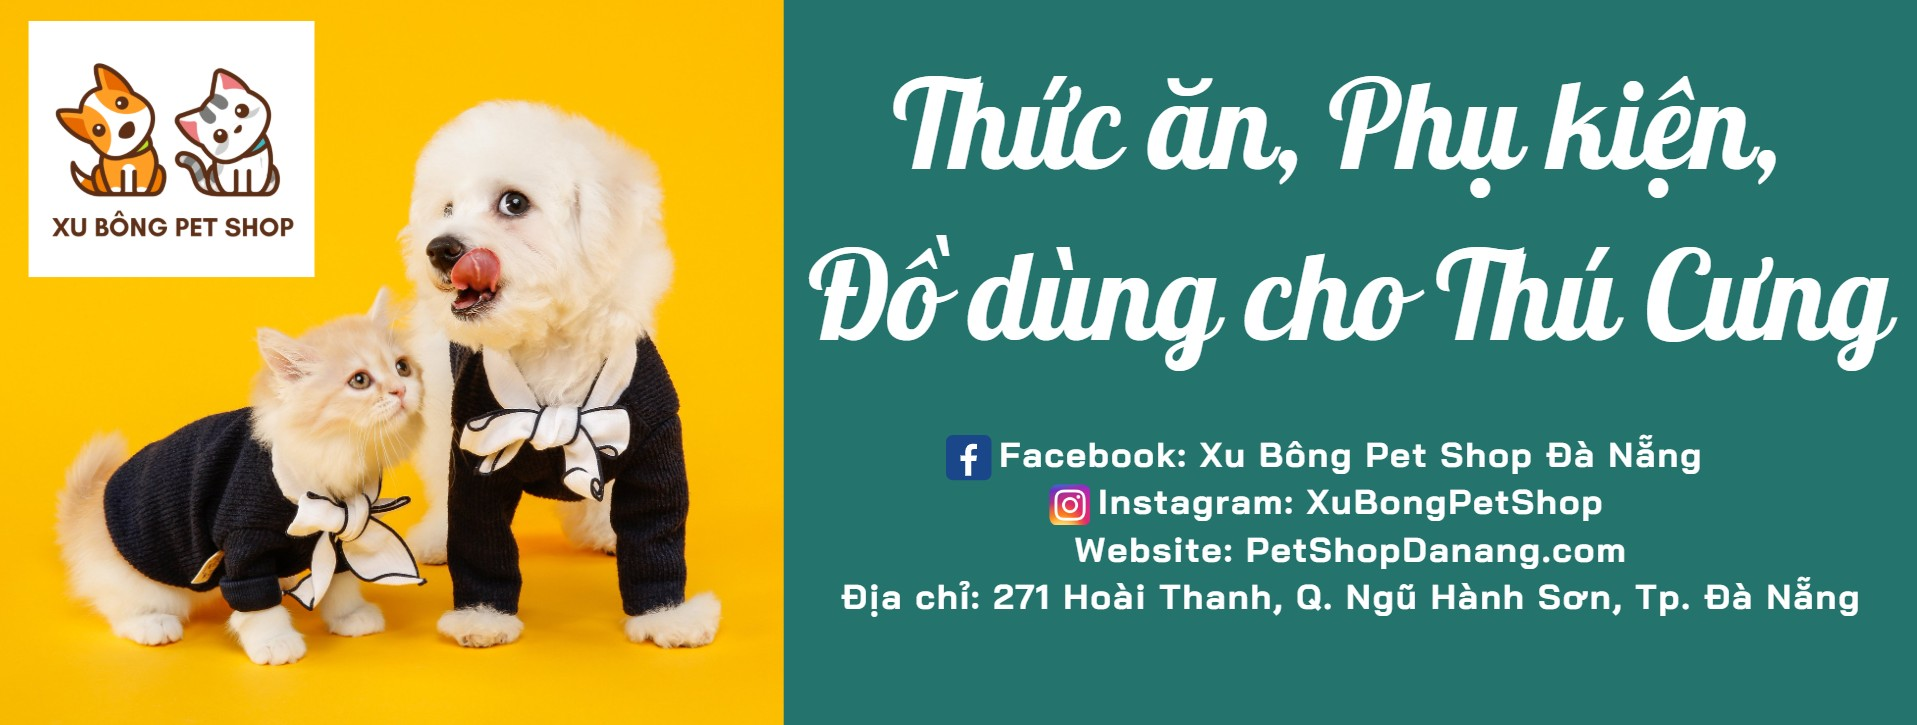 Xu Bông Pet Shop